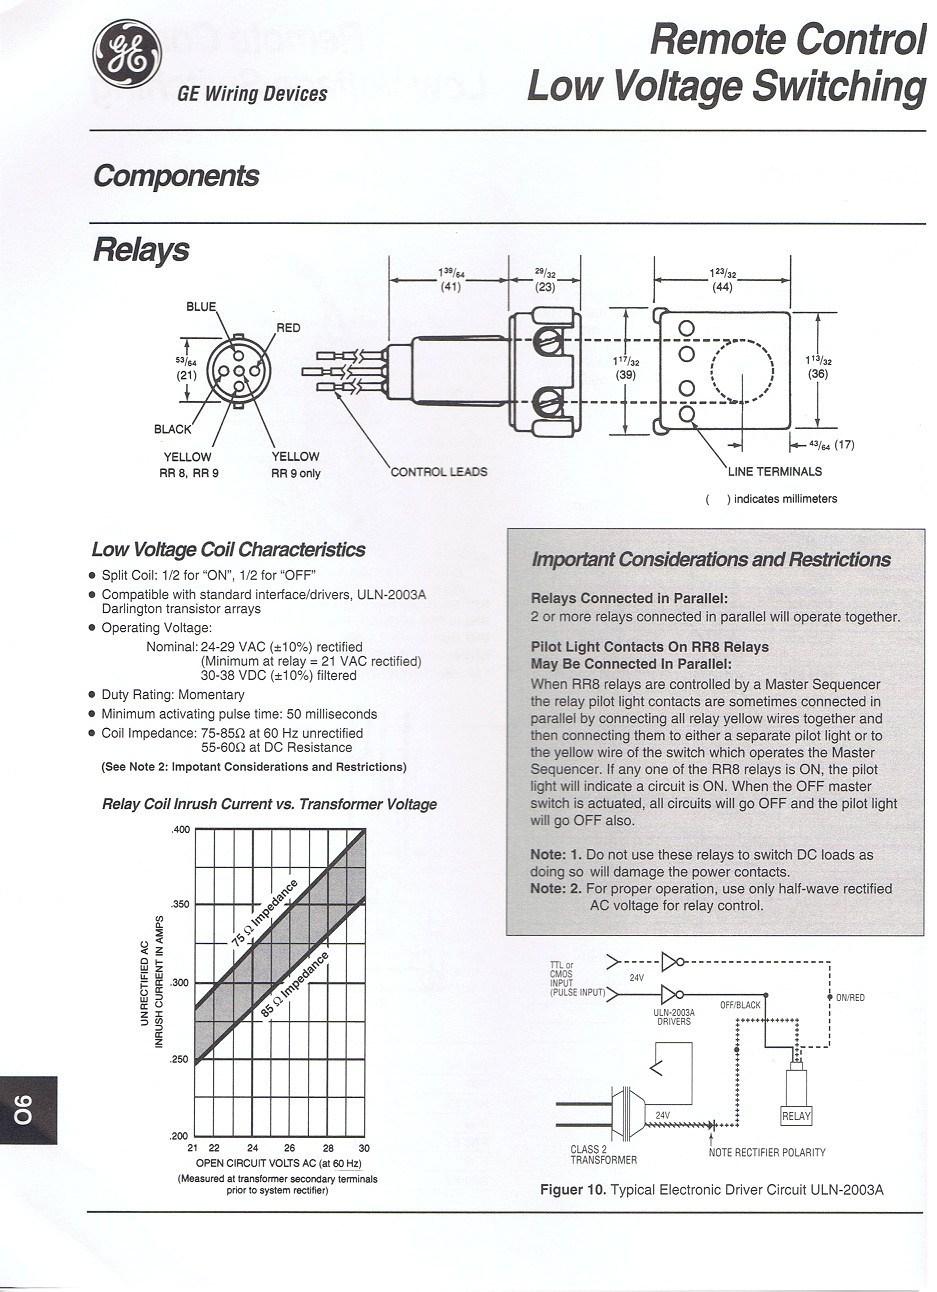 Ge Rr8 Relay Wiring Diagram - 2006 Pontiac G6 Wiring Diagram -  hyundaiii.tukune.jeanjaures37.fr   Ge Rr8 Relay Wiring Diagram      Wiring Diagram Resource